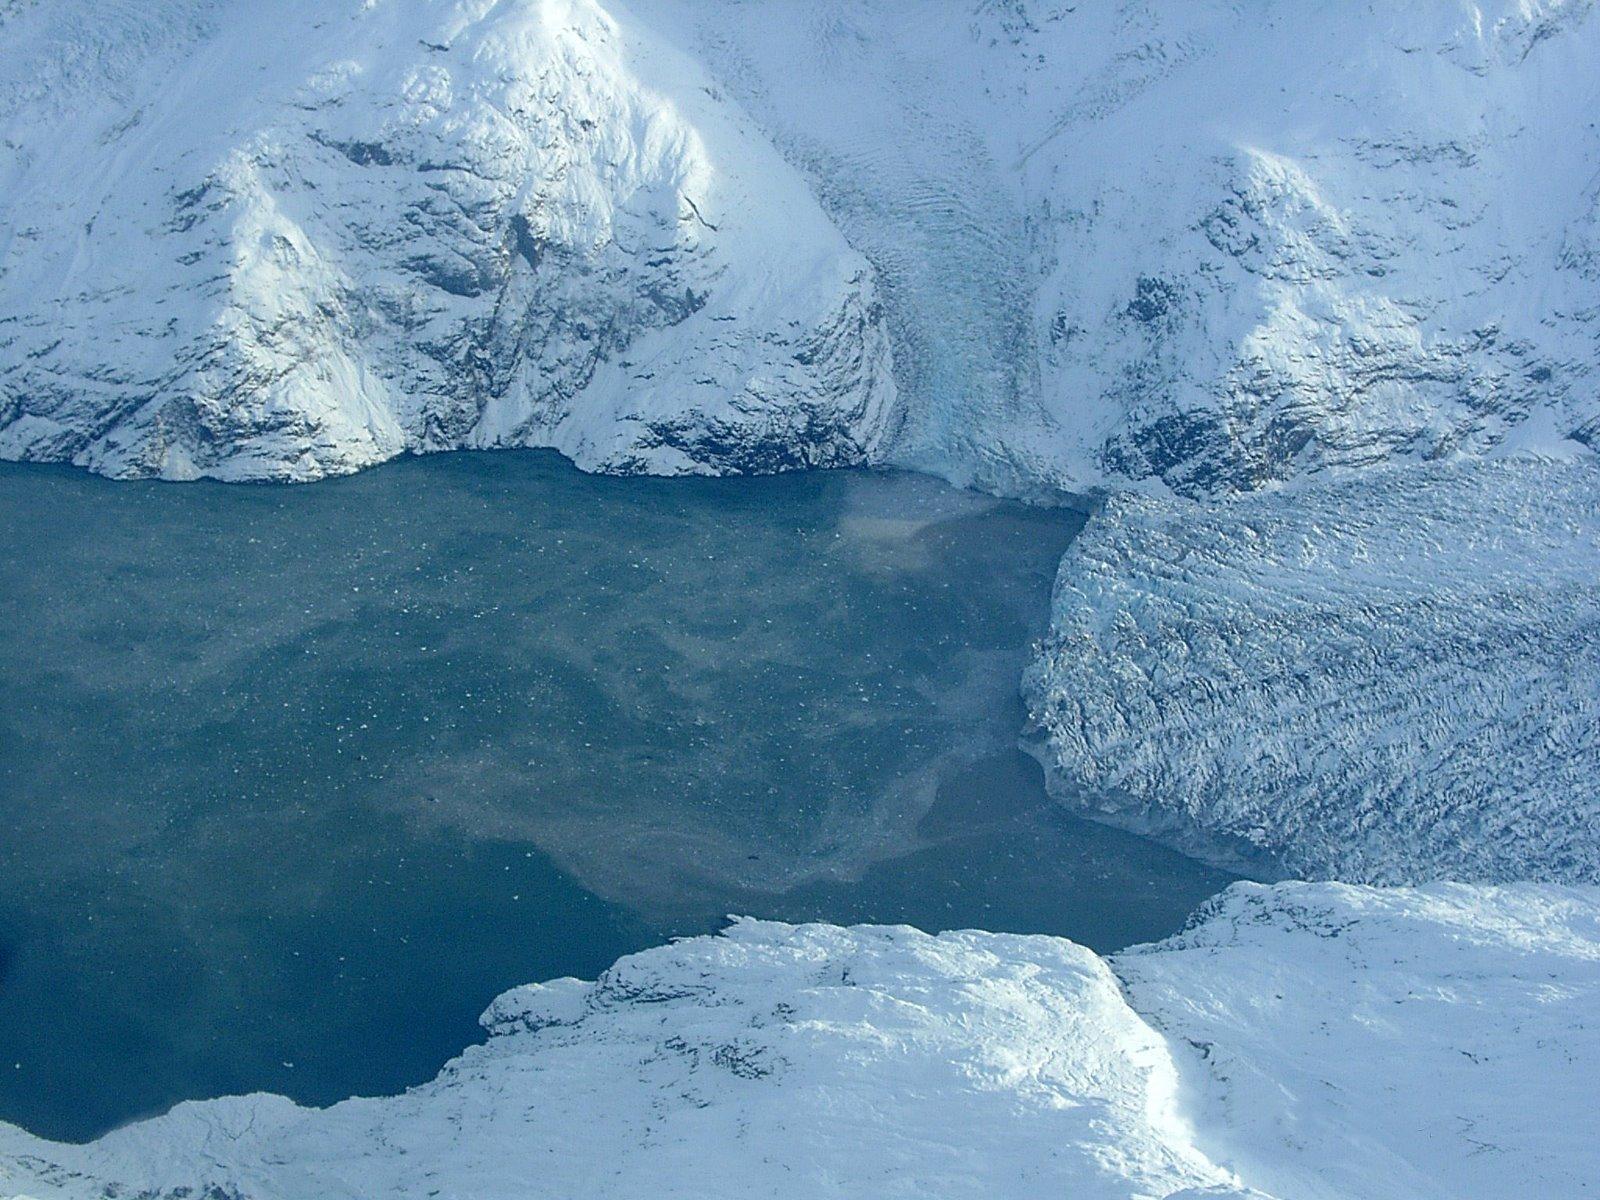 Icebergs at Johns Hopkins Glacier.